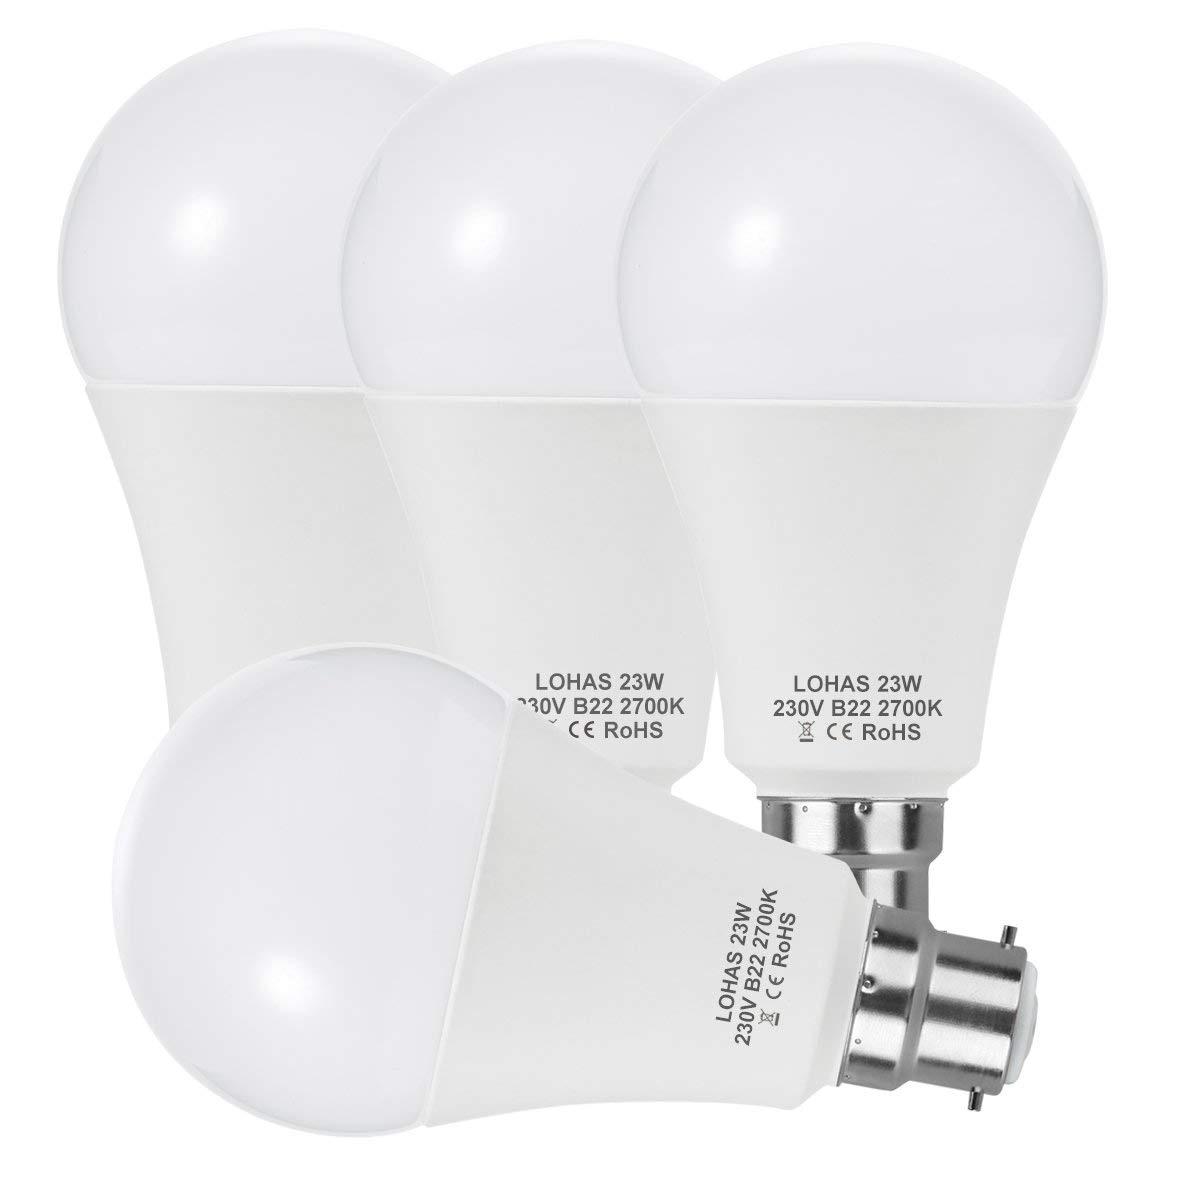 LED A65 B22 Bayonet Bulbs 200W Equivalent 23W LED Lights Warm White 2700K Super Bright 2500Lm